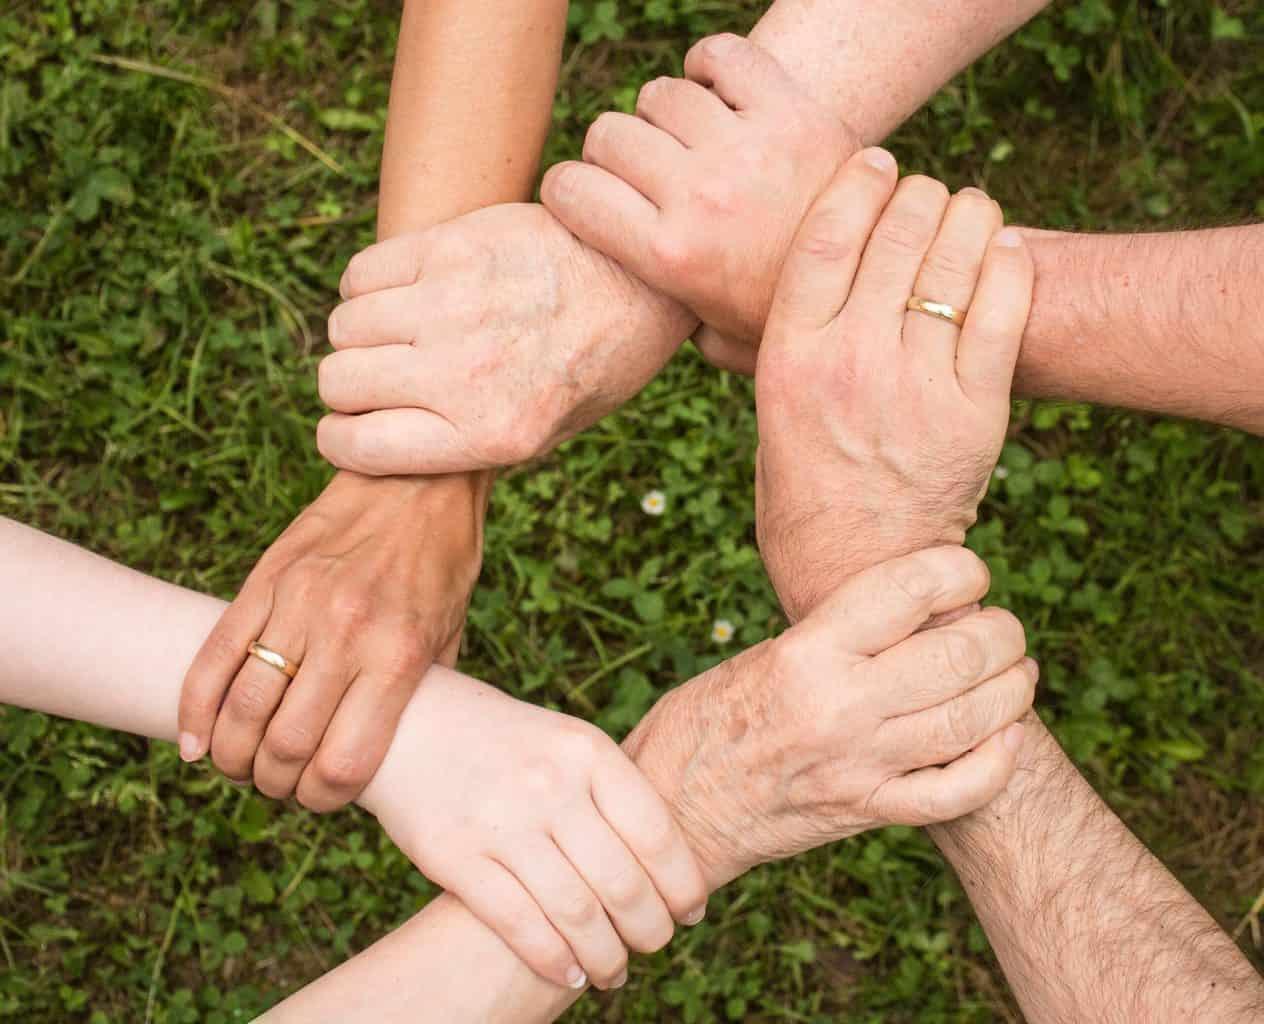 team spirit, teamwork, community